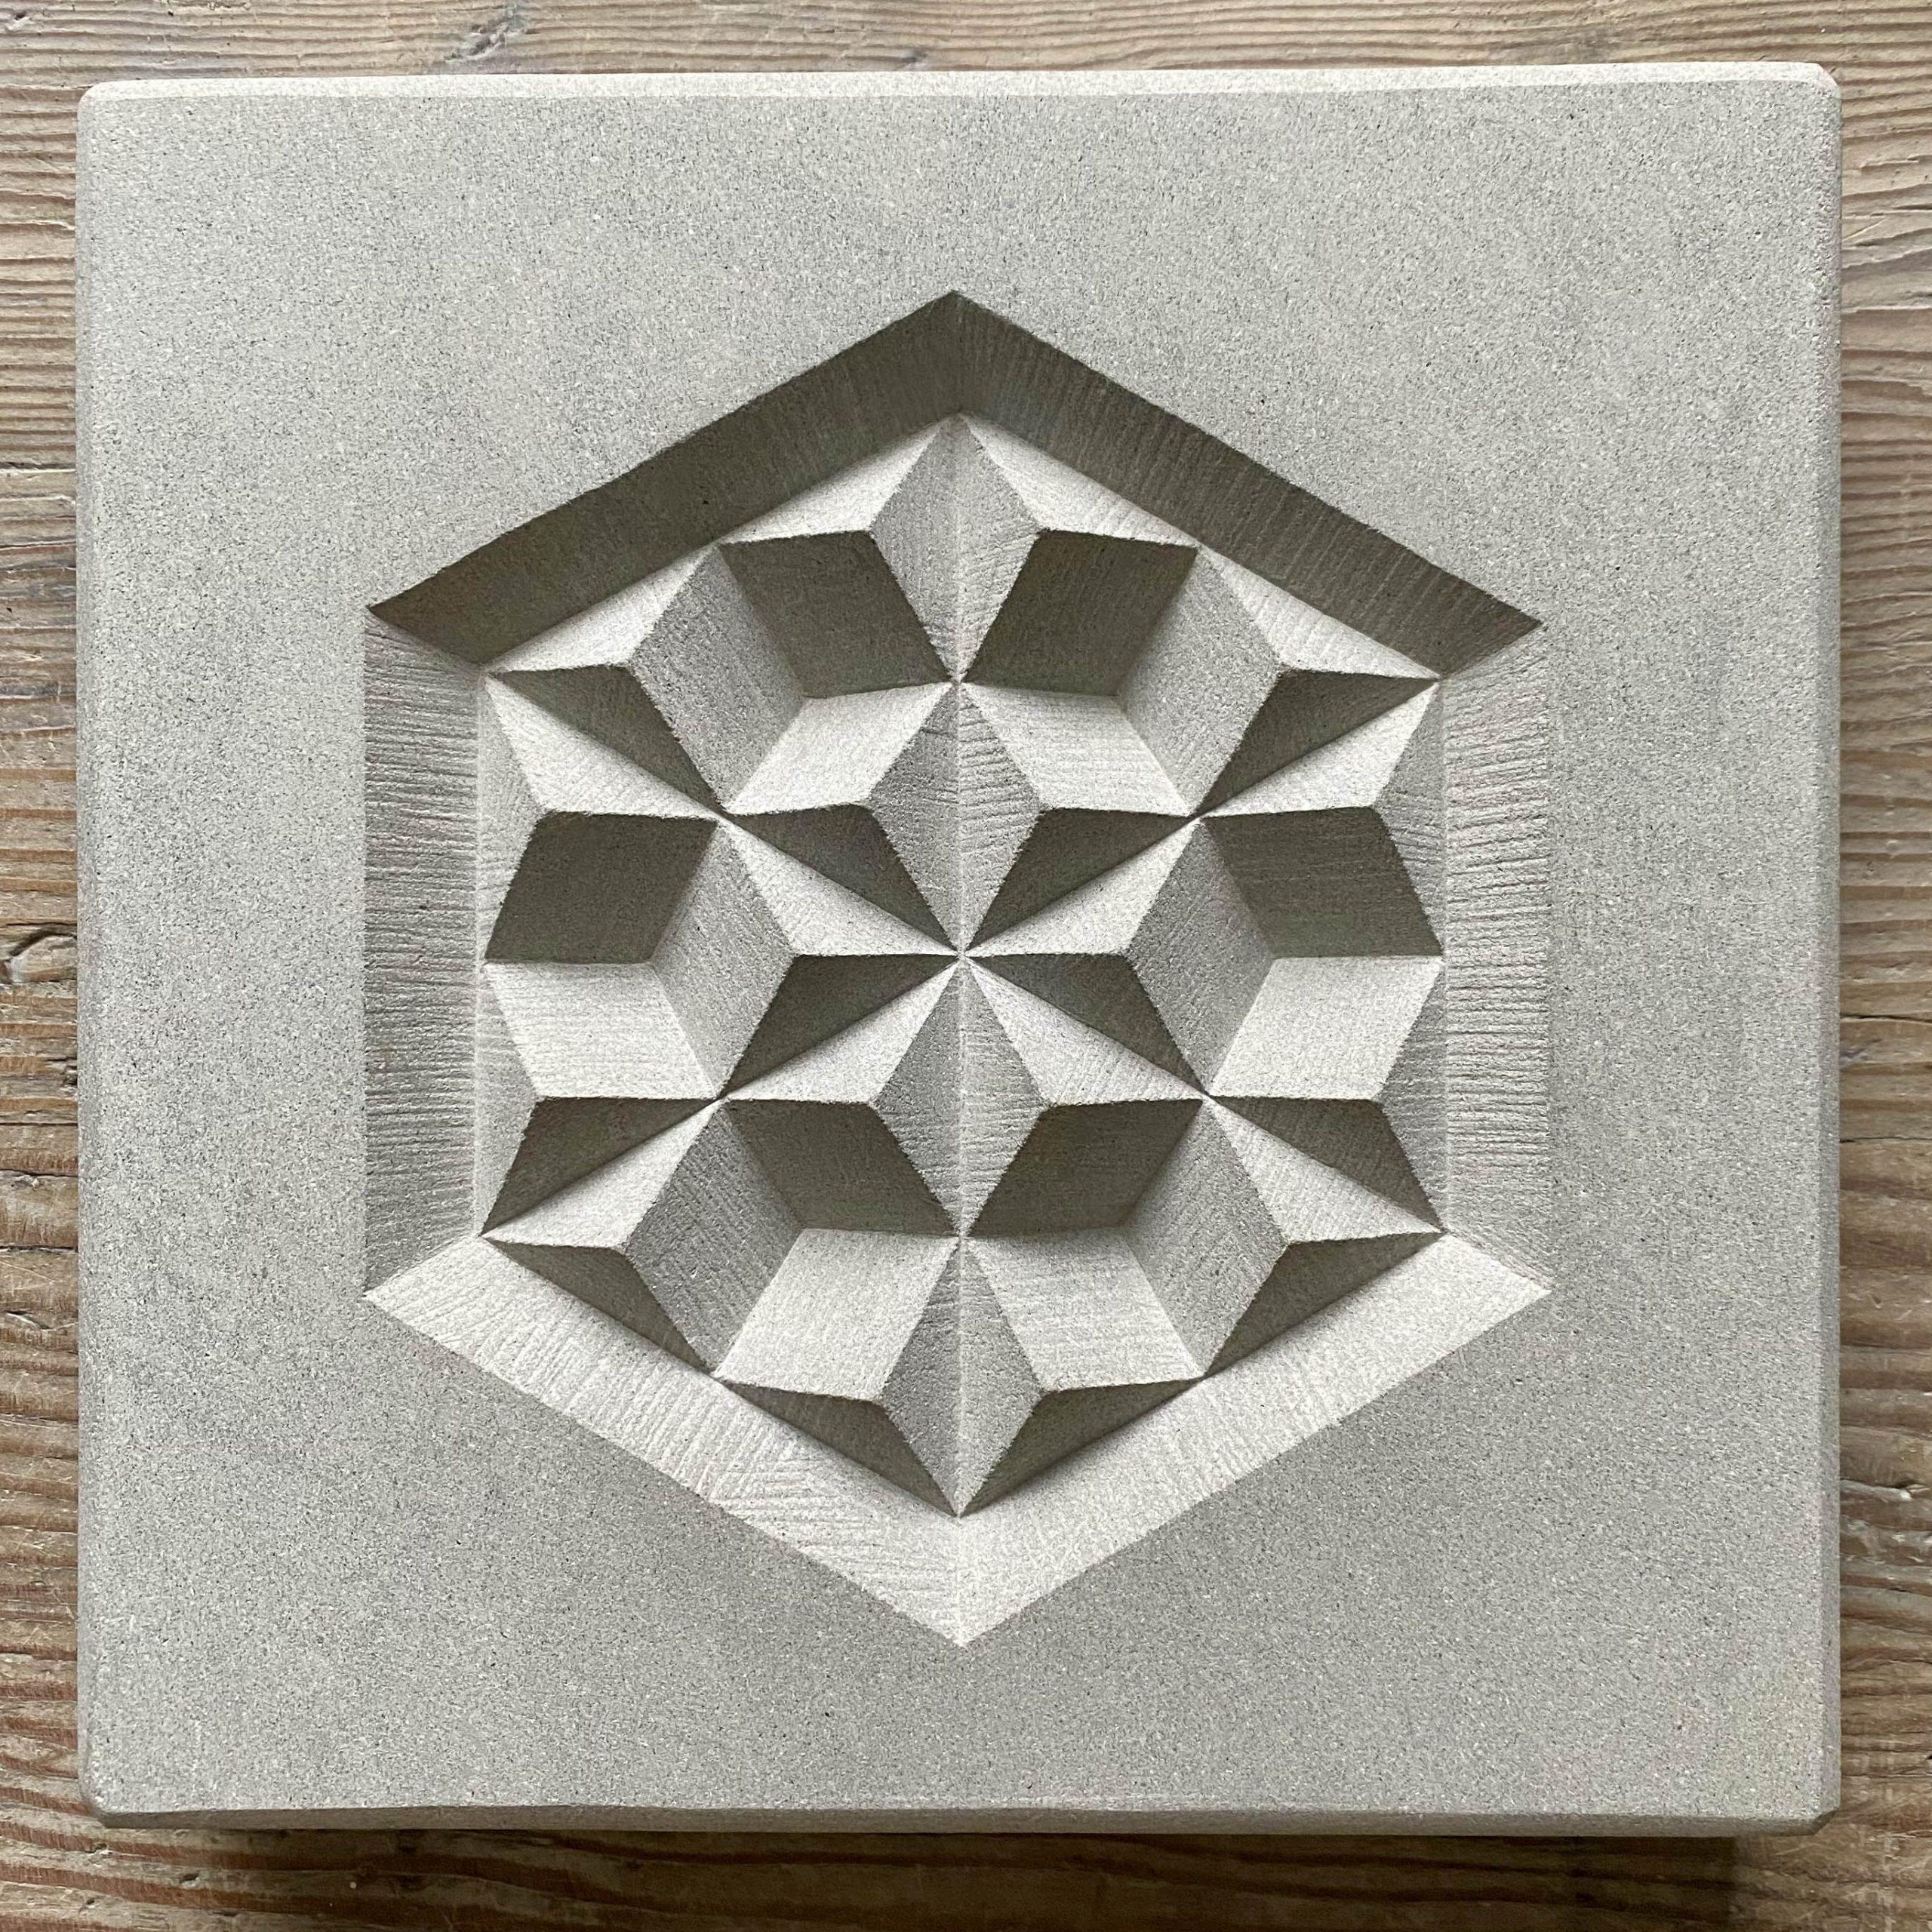 Hand carved geometric pattern in a buff colour Portland limestone